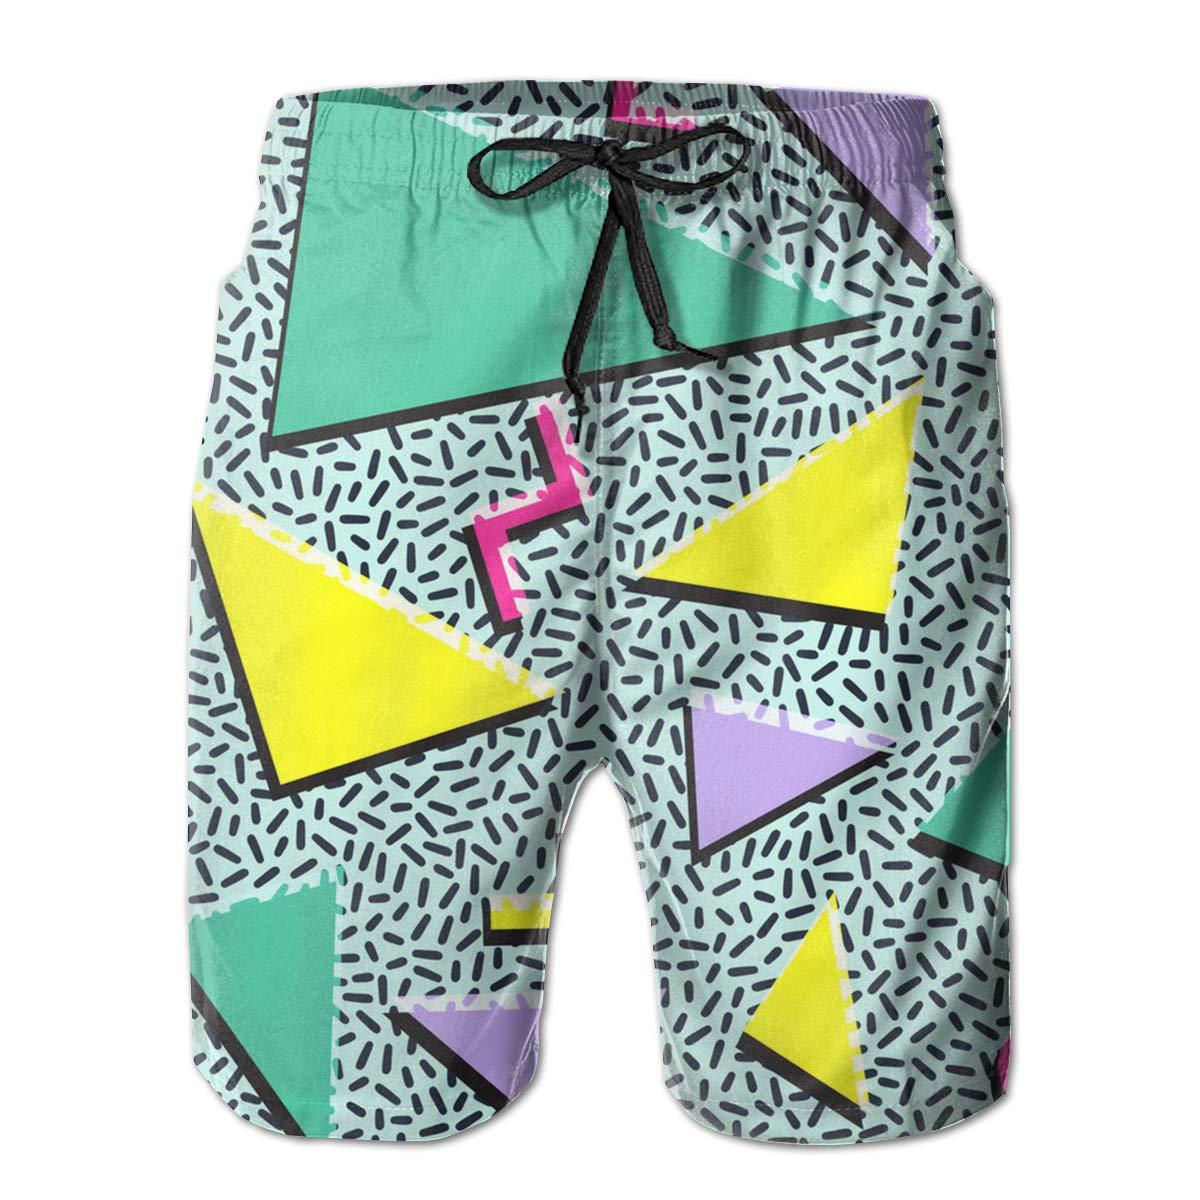 Mens Vintage 80S 90S Fashion Style Design Beach Surfing Board Shorts Swim Trunks Pants